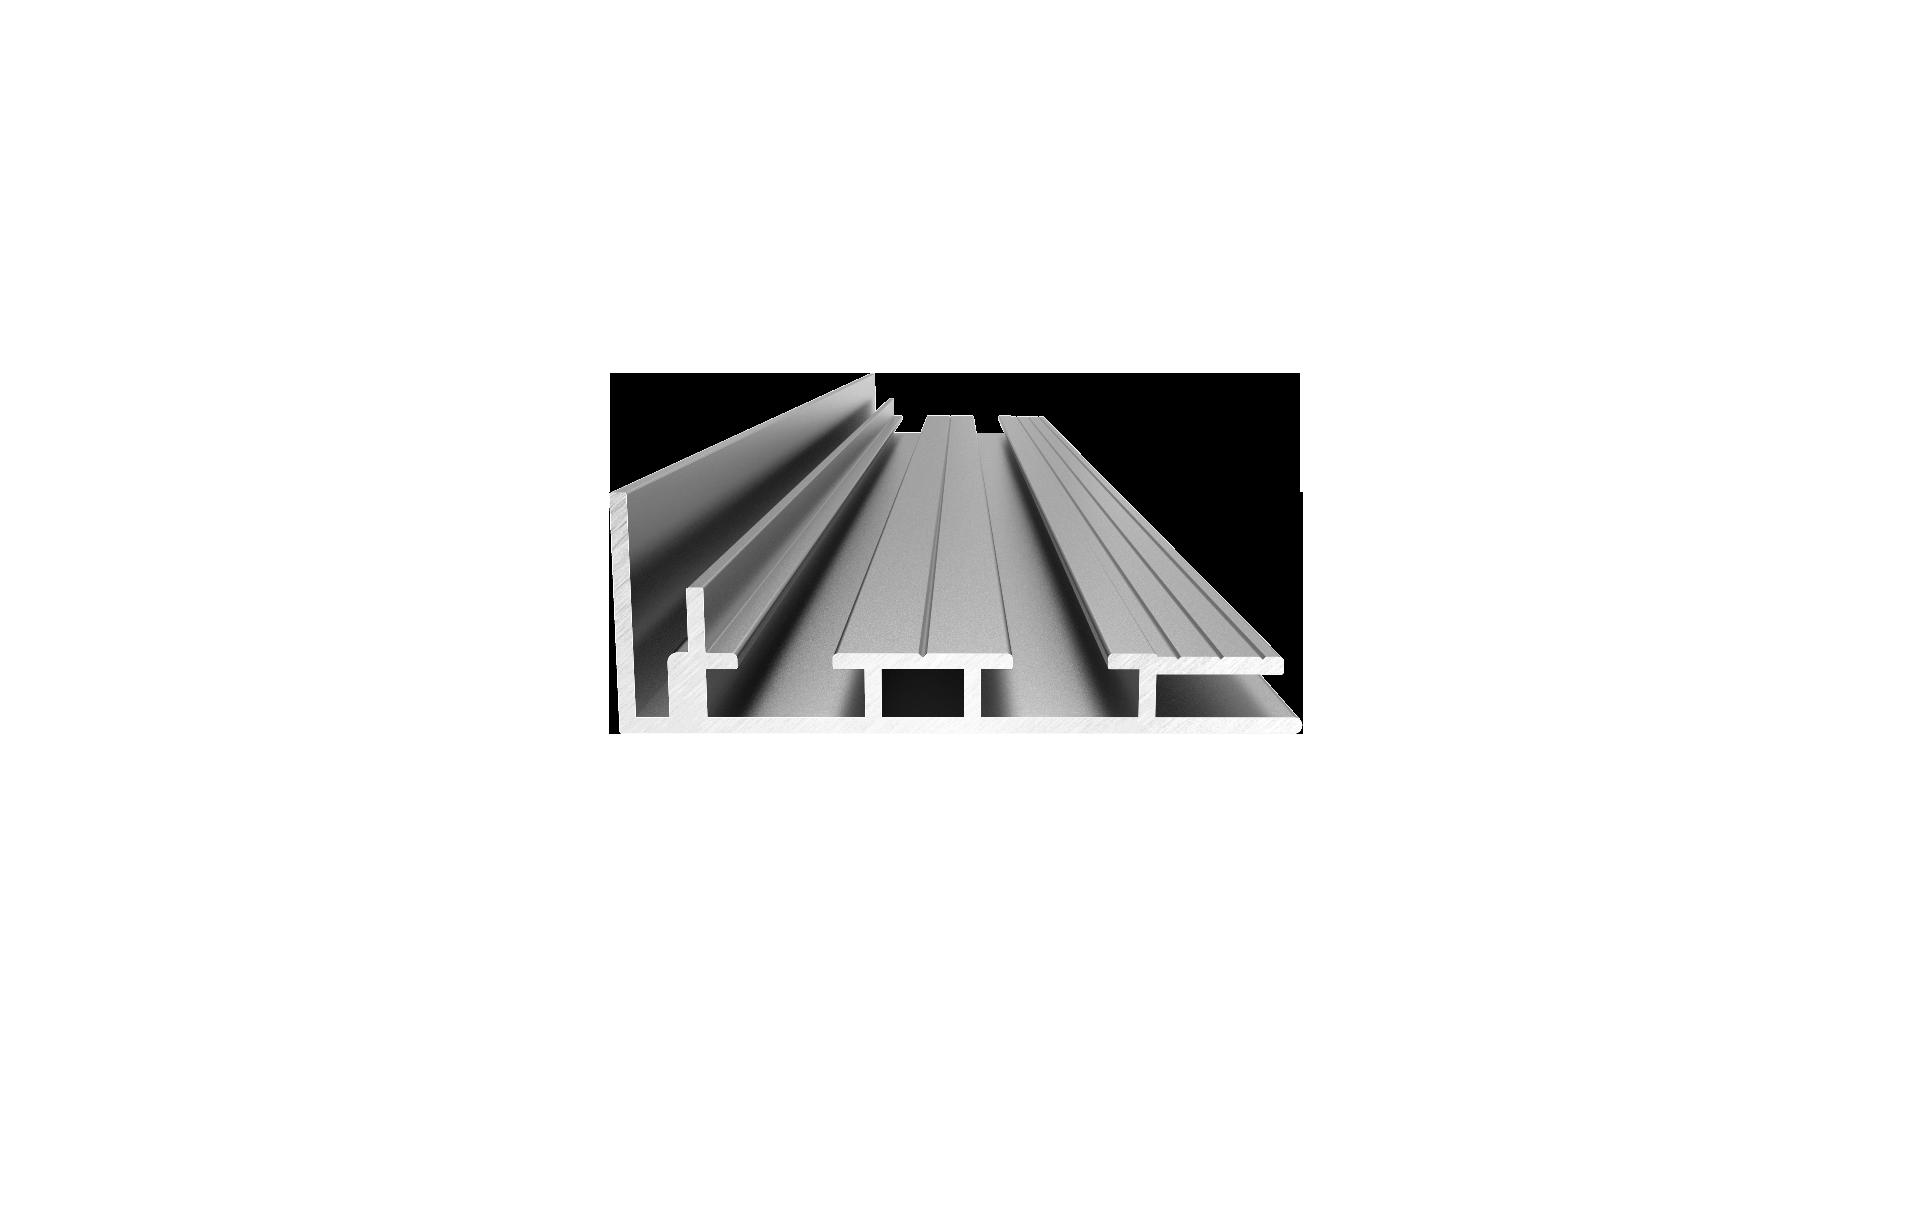 Profile 65 - Single SidedVisible edge 65mmBacklit or Edgelit